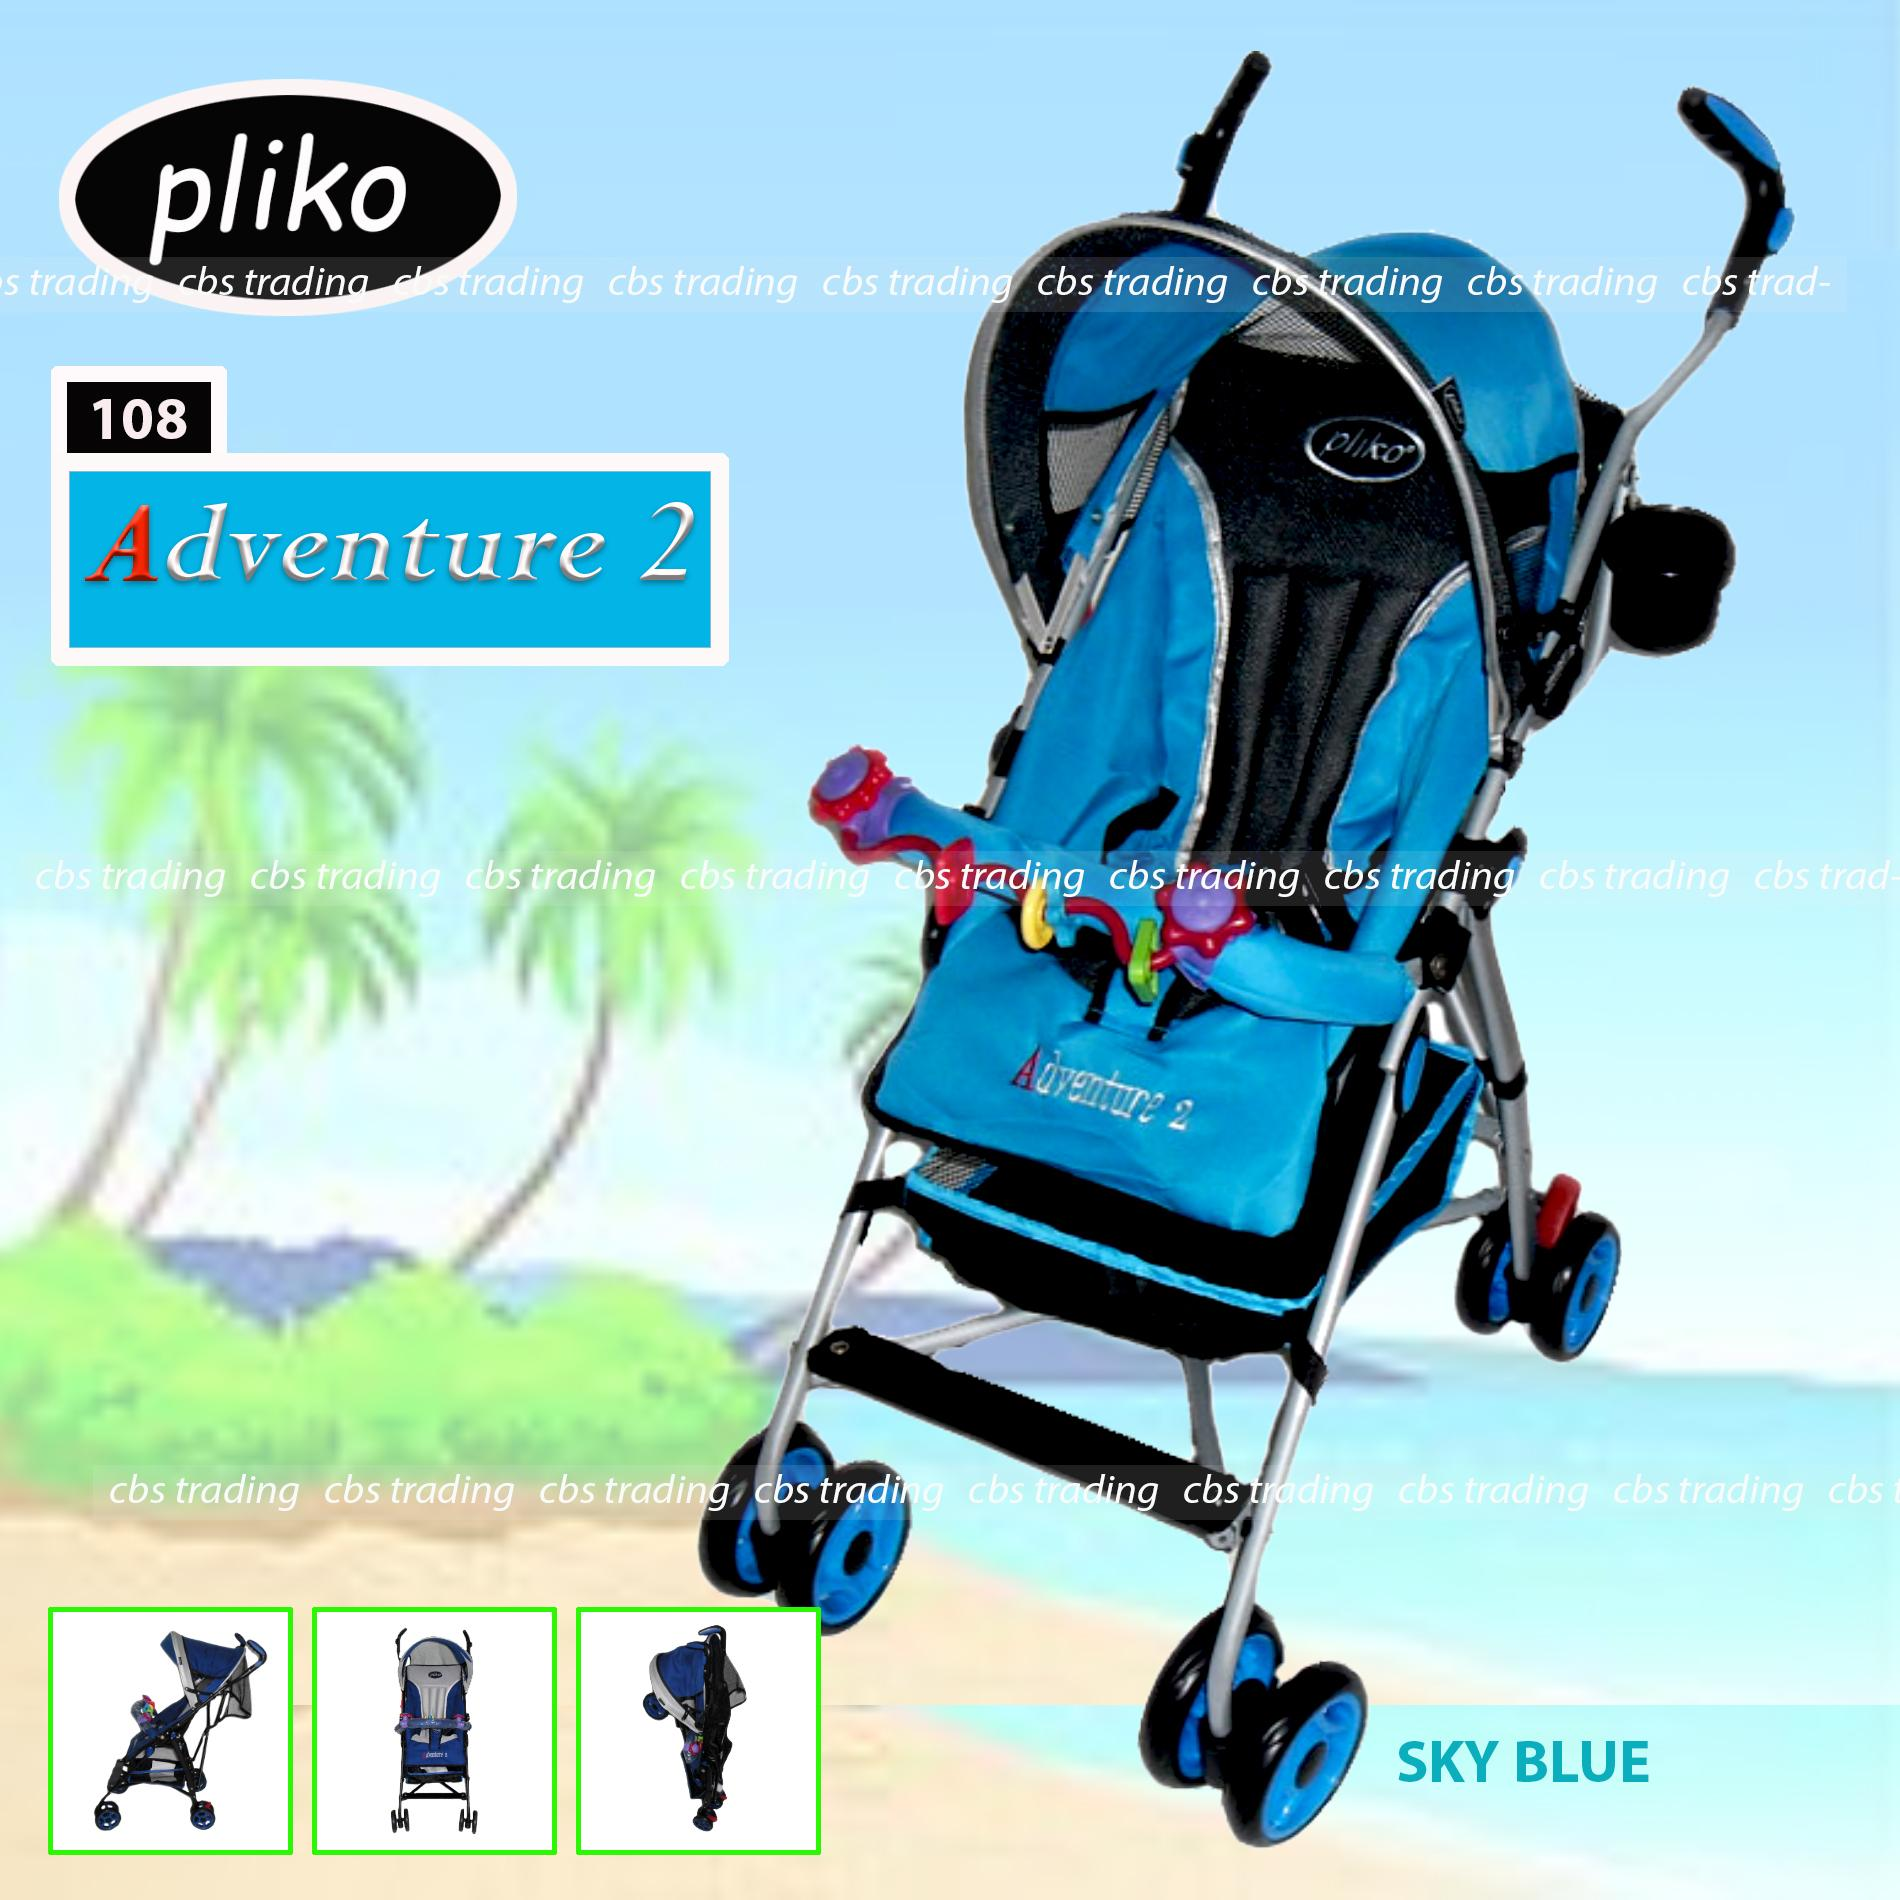 Pliko Stroller New Buggy Adventure 2 S-108 Kereta Dorong Bayi - Biru